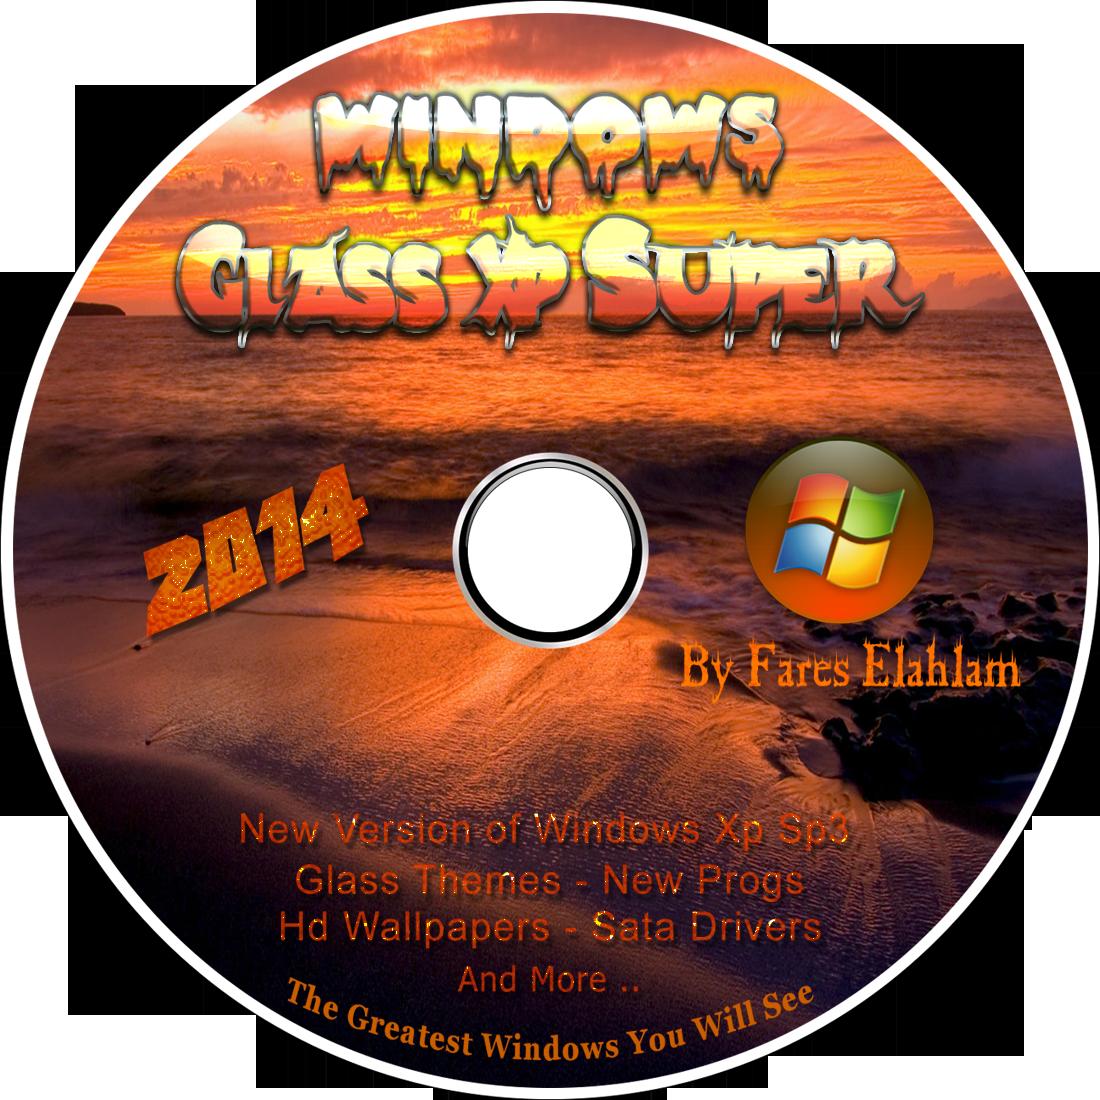 Download Windows Glass Xp Super 2014 | Jendela, Windows, Komputer